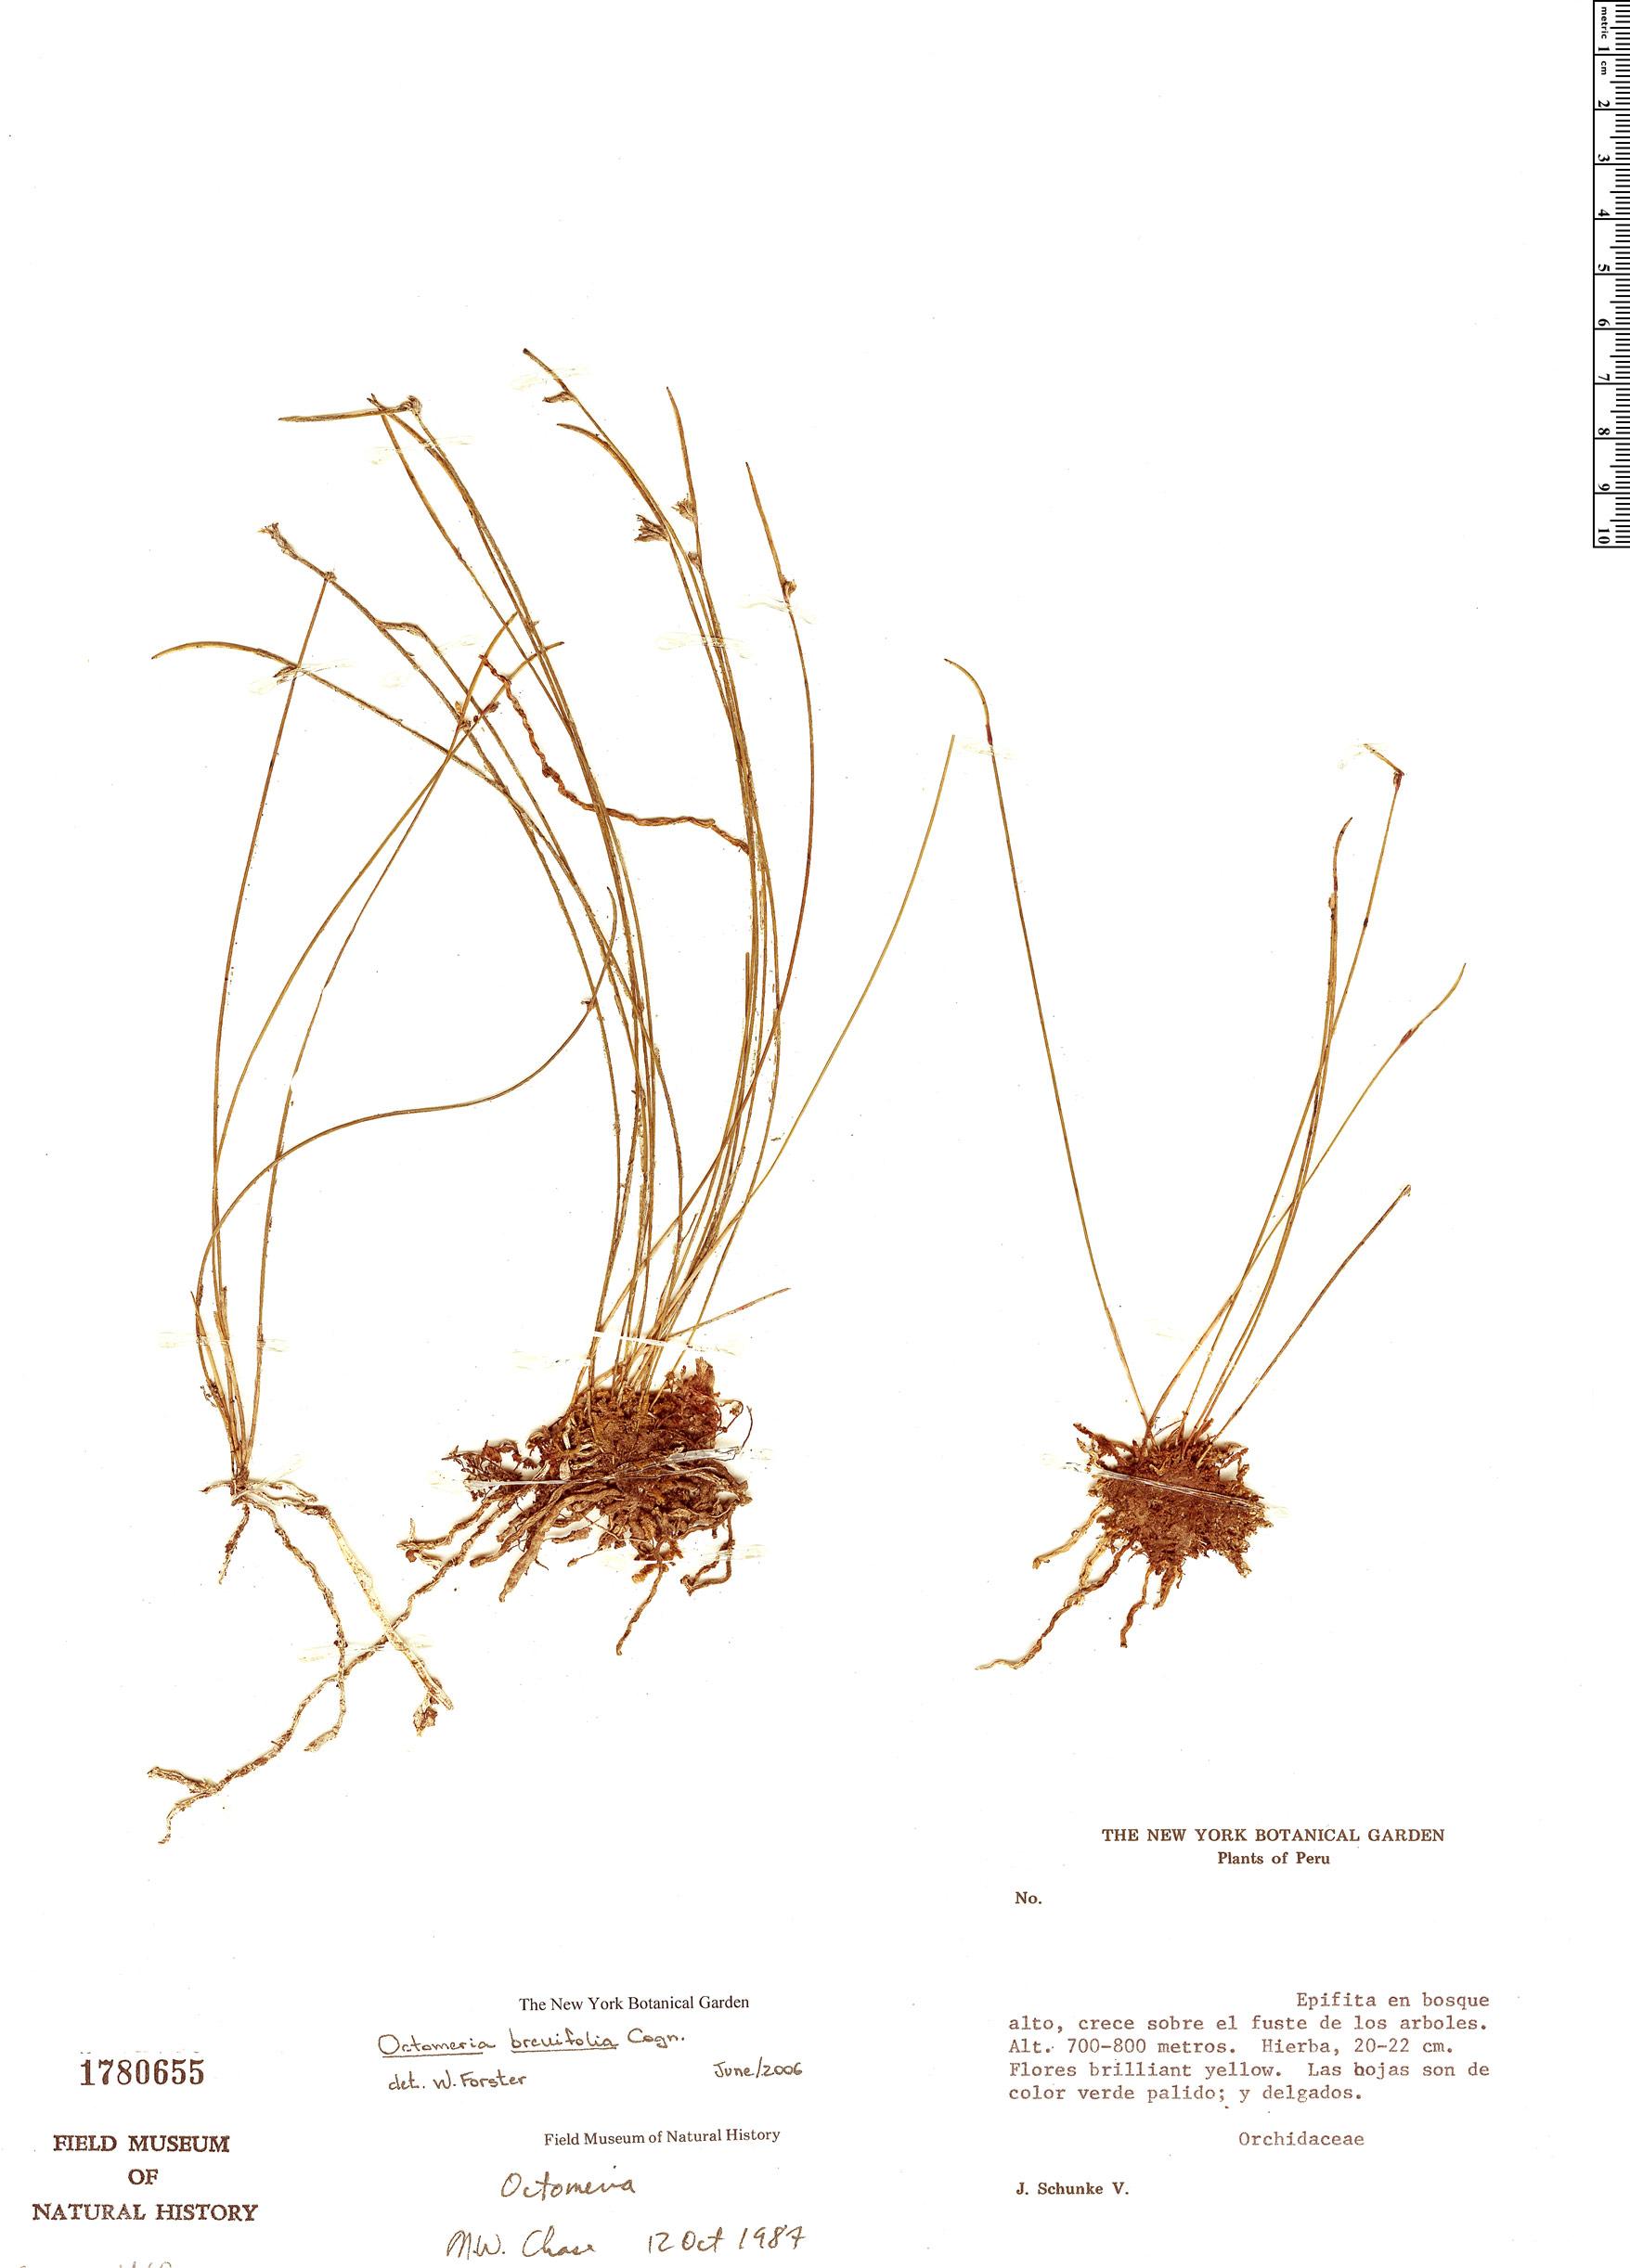 Espécimen: Octomeria scirpoidea